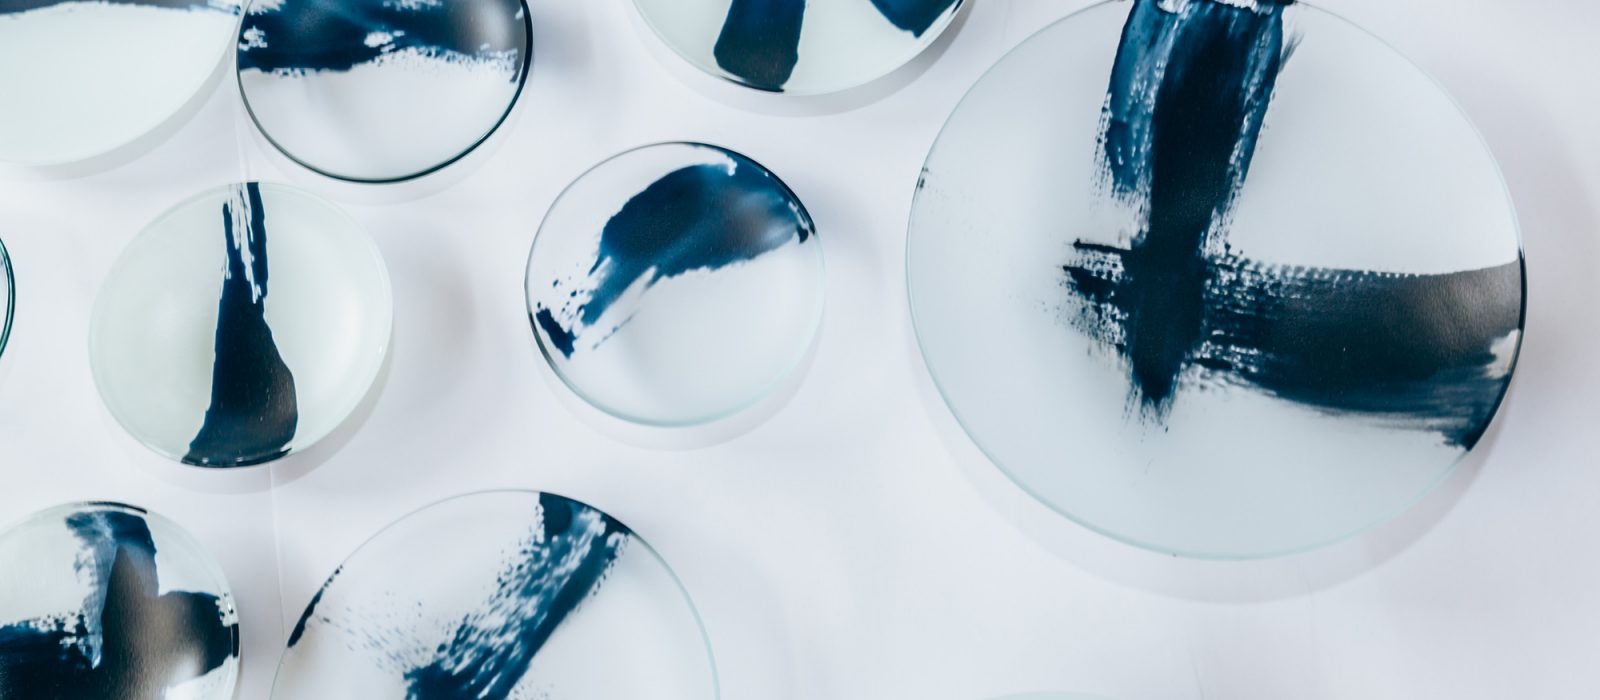 Lisa Cahill, Indigo Swish Bowls, kilnformed glass. Photo: 5 Foot Photography.